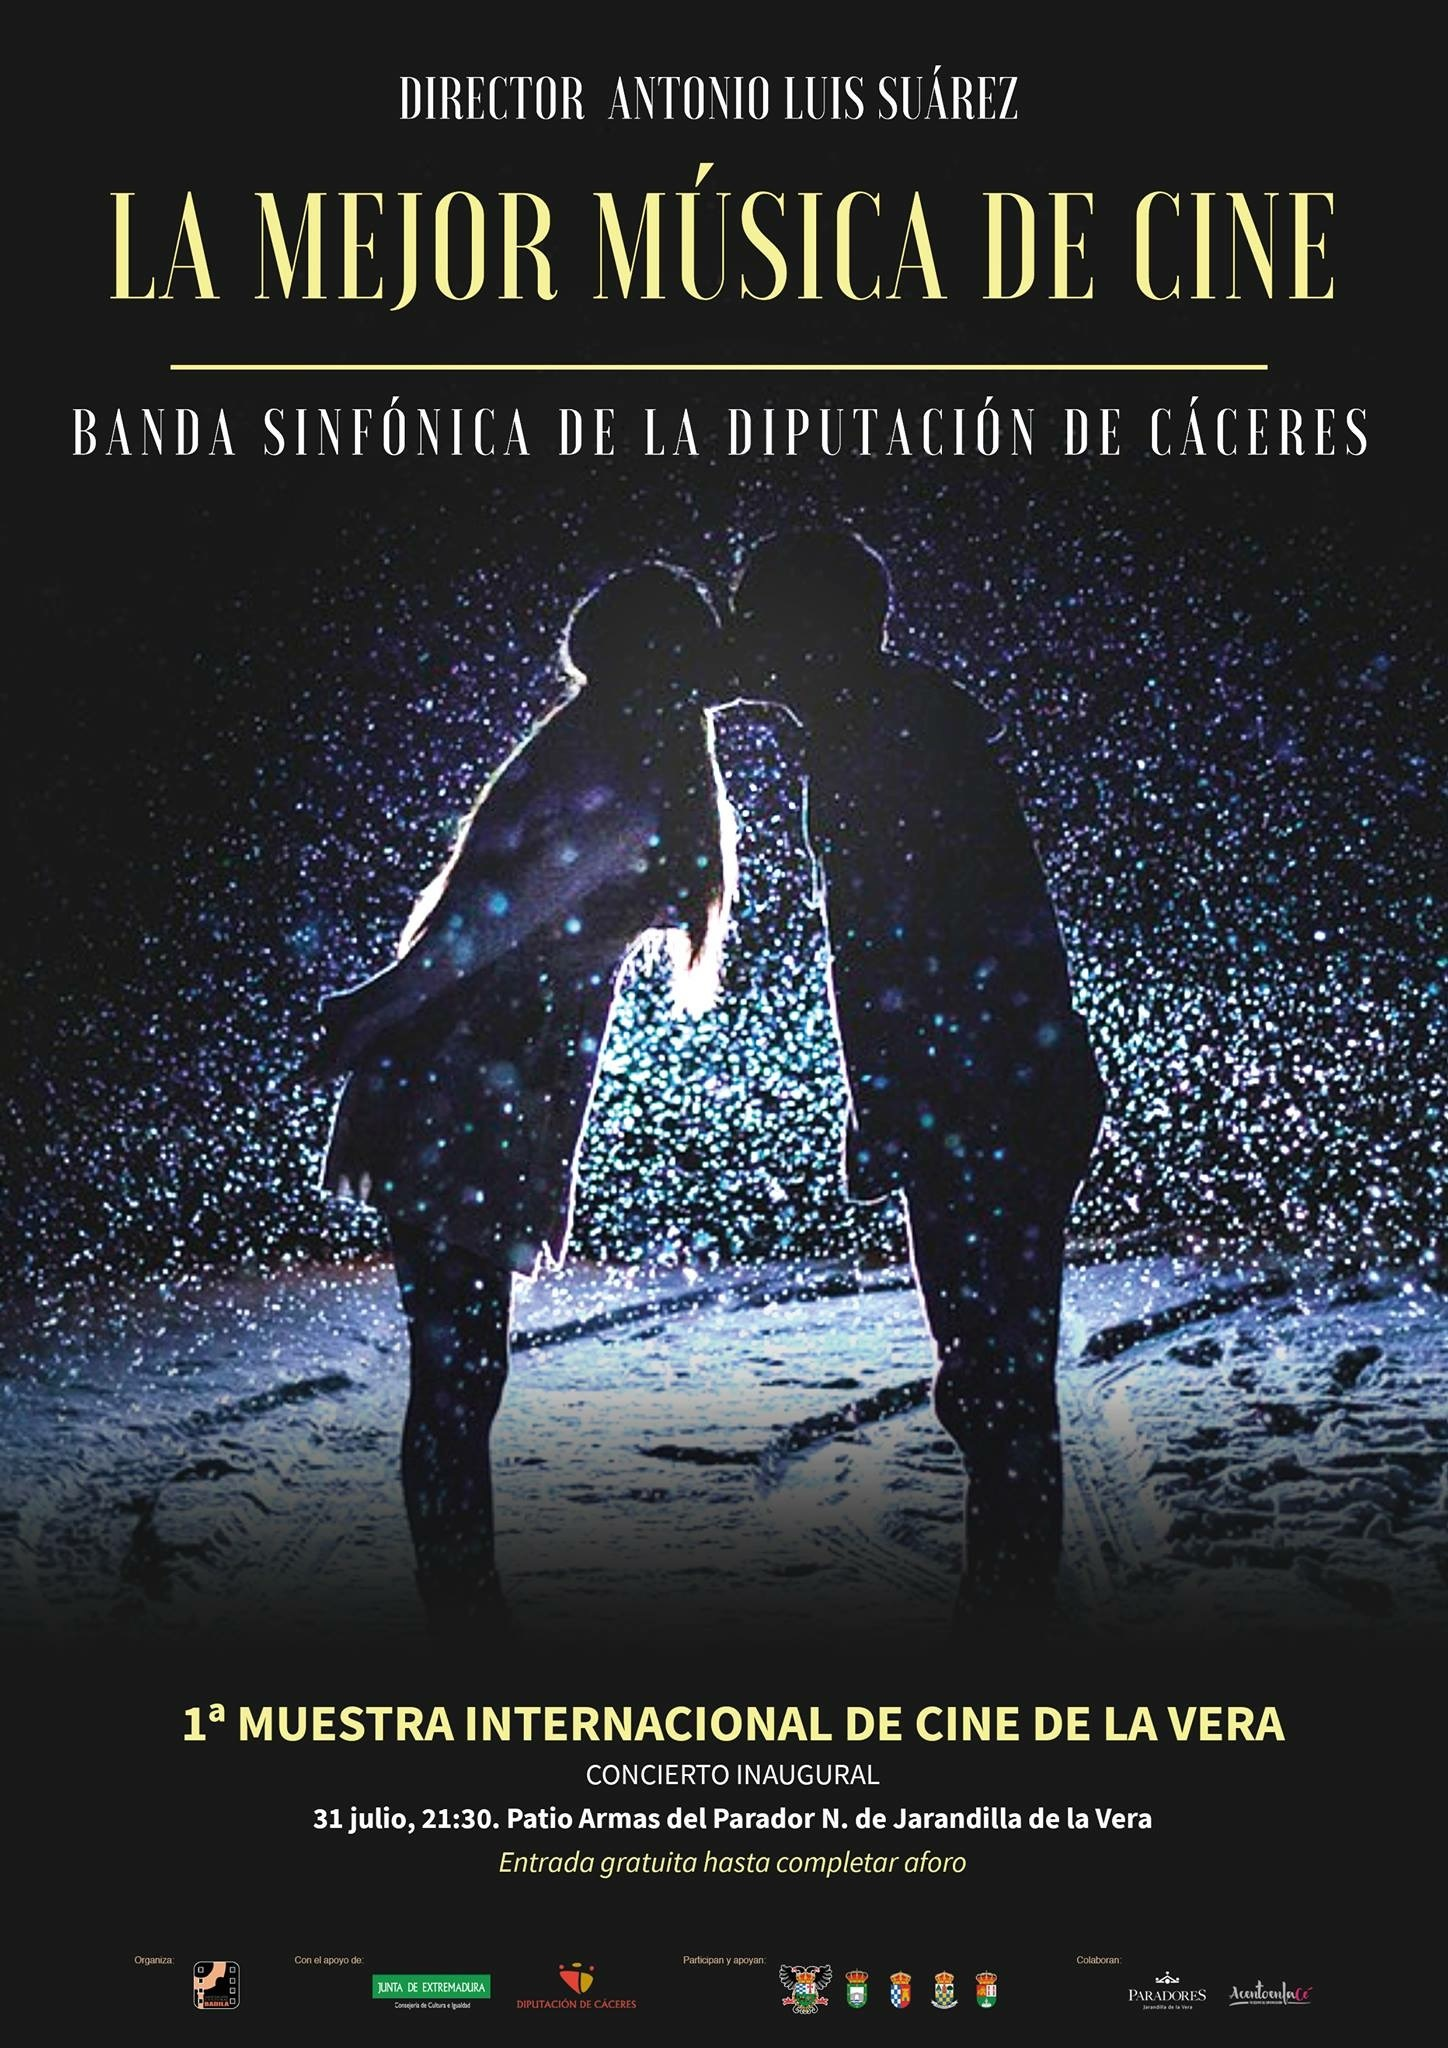 I Muestra internacional de cine de la Vera - Jarandilla de La Vera